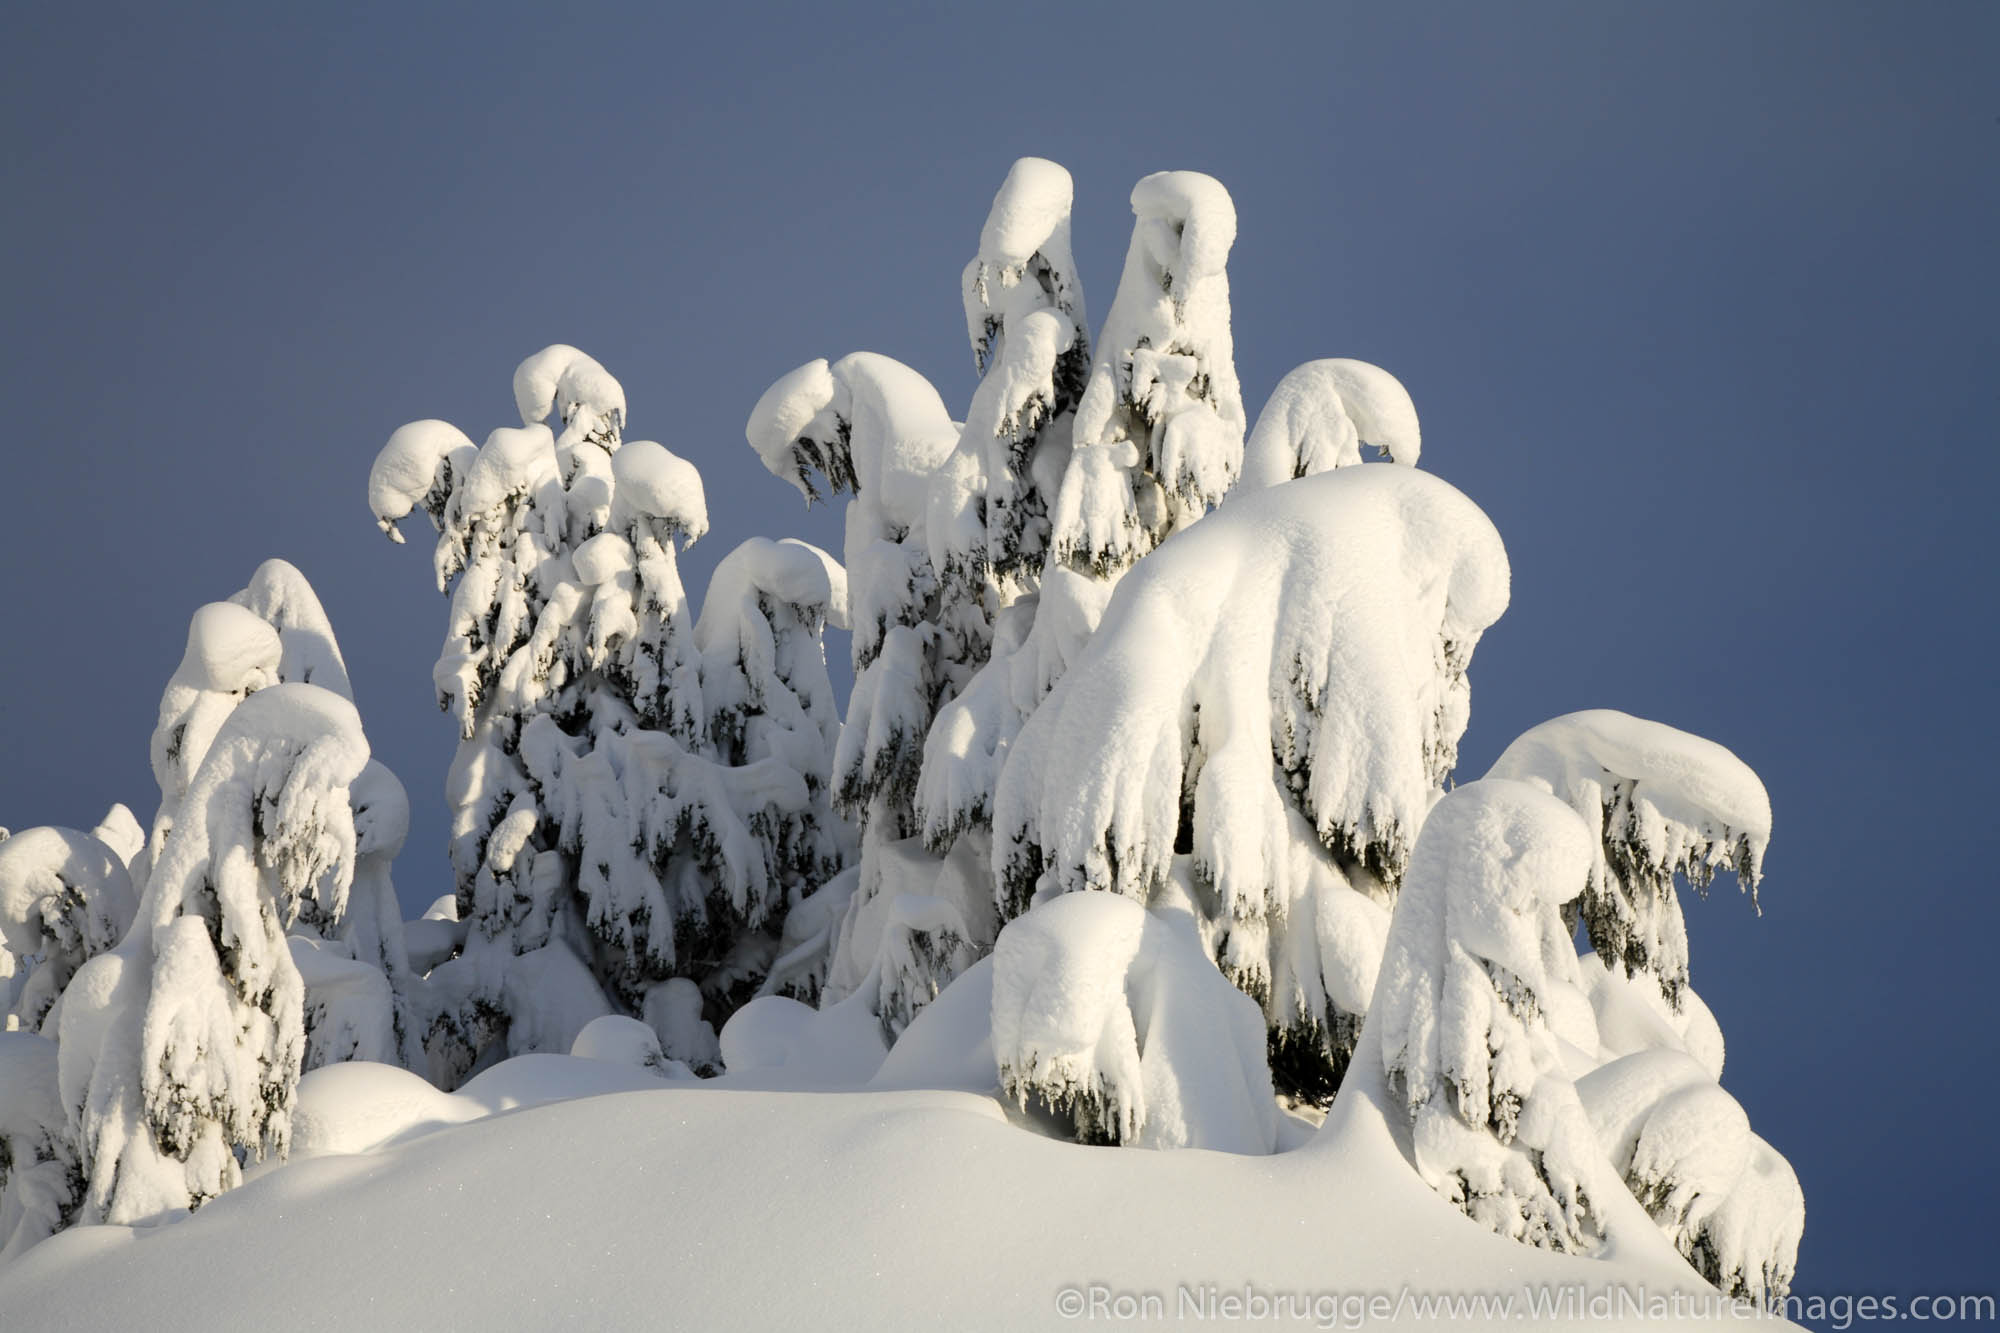 Winter in Turnagain Pass, Chugach National Forest, Alaska.